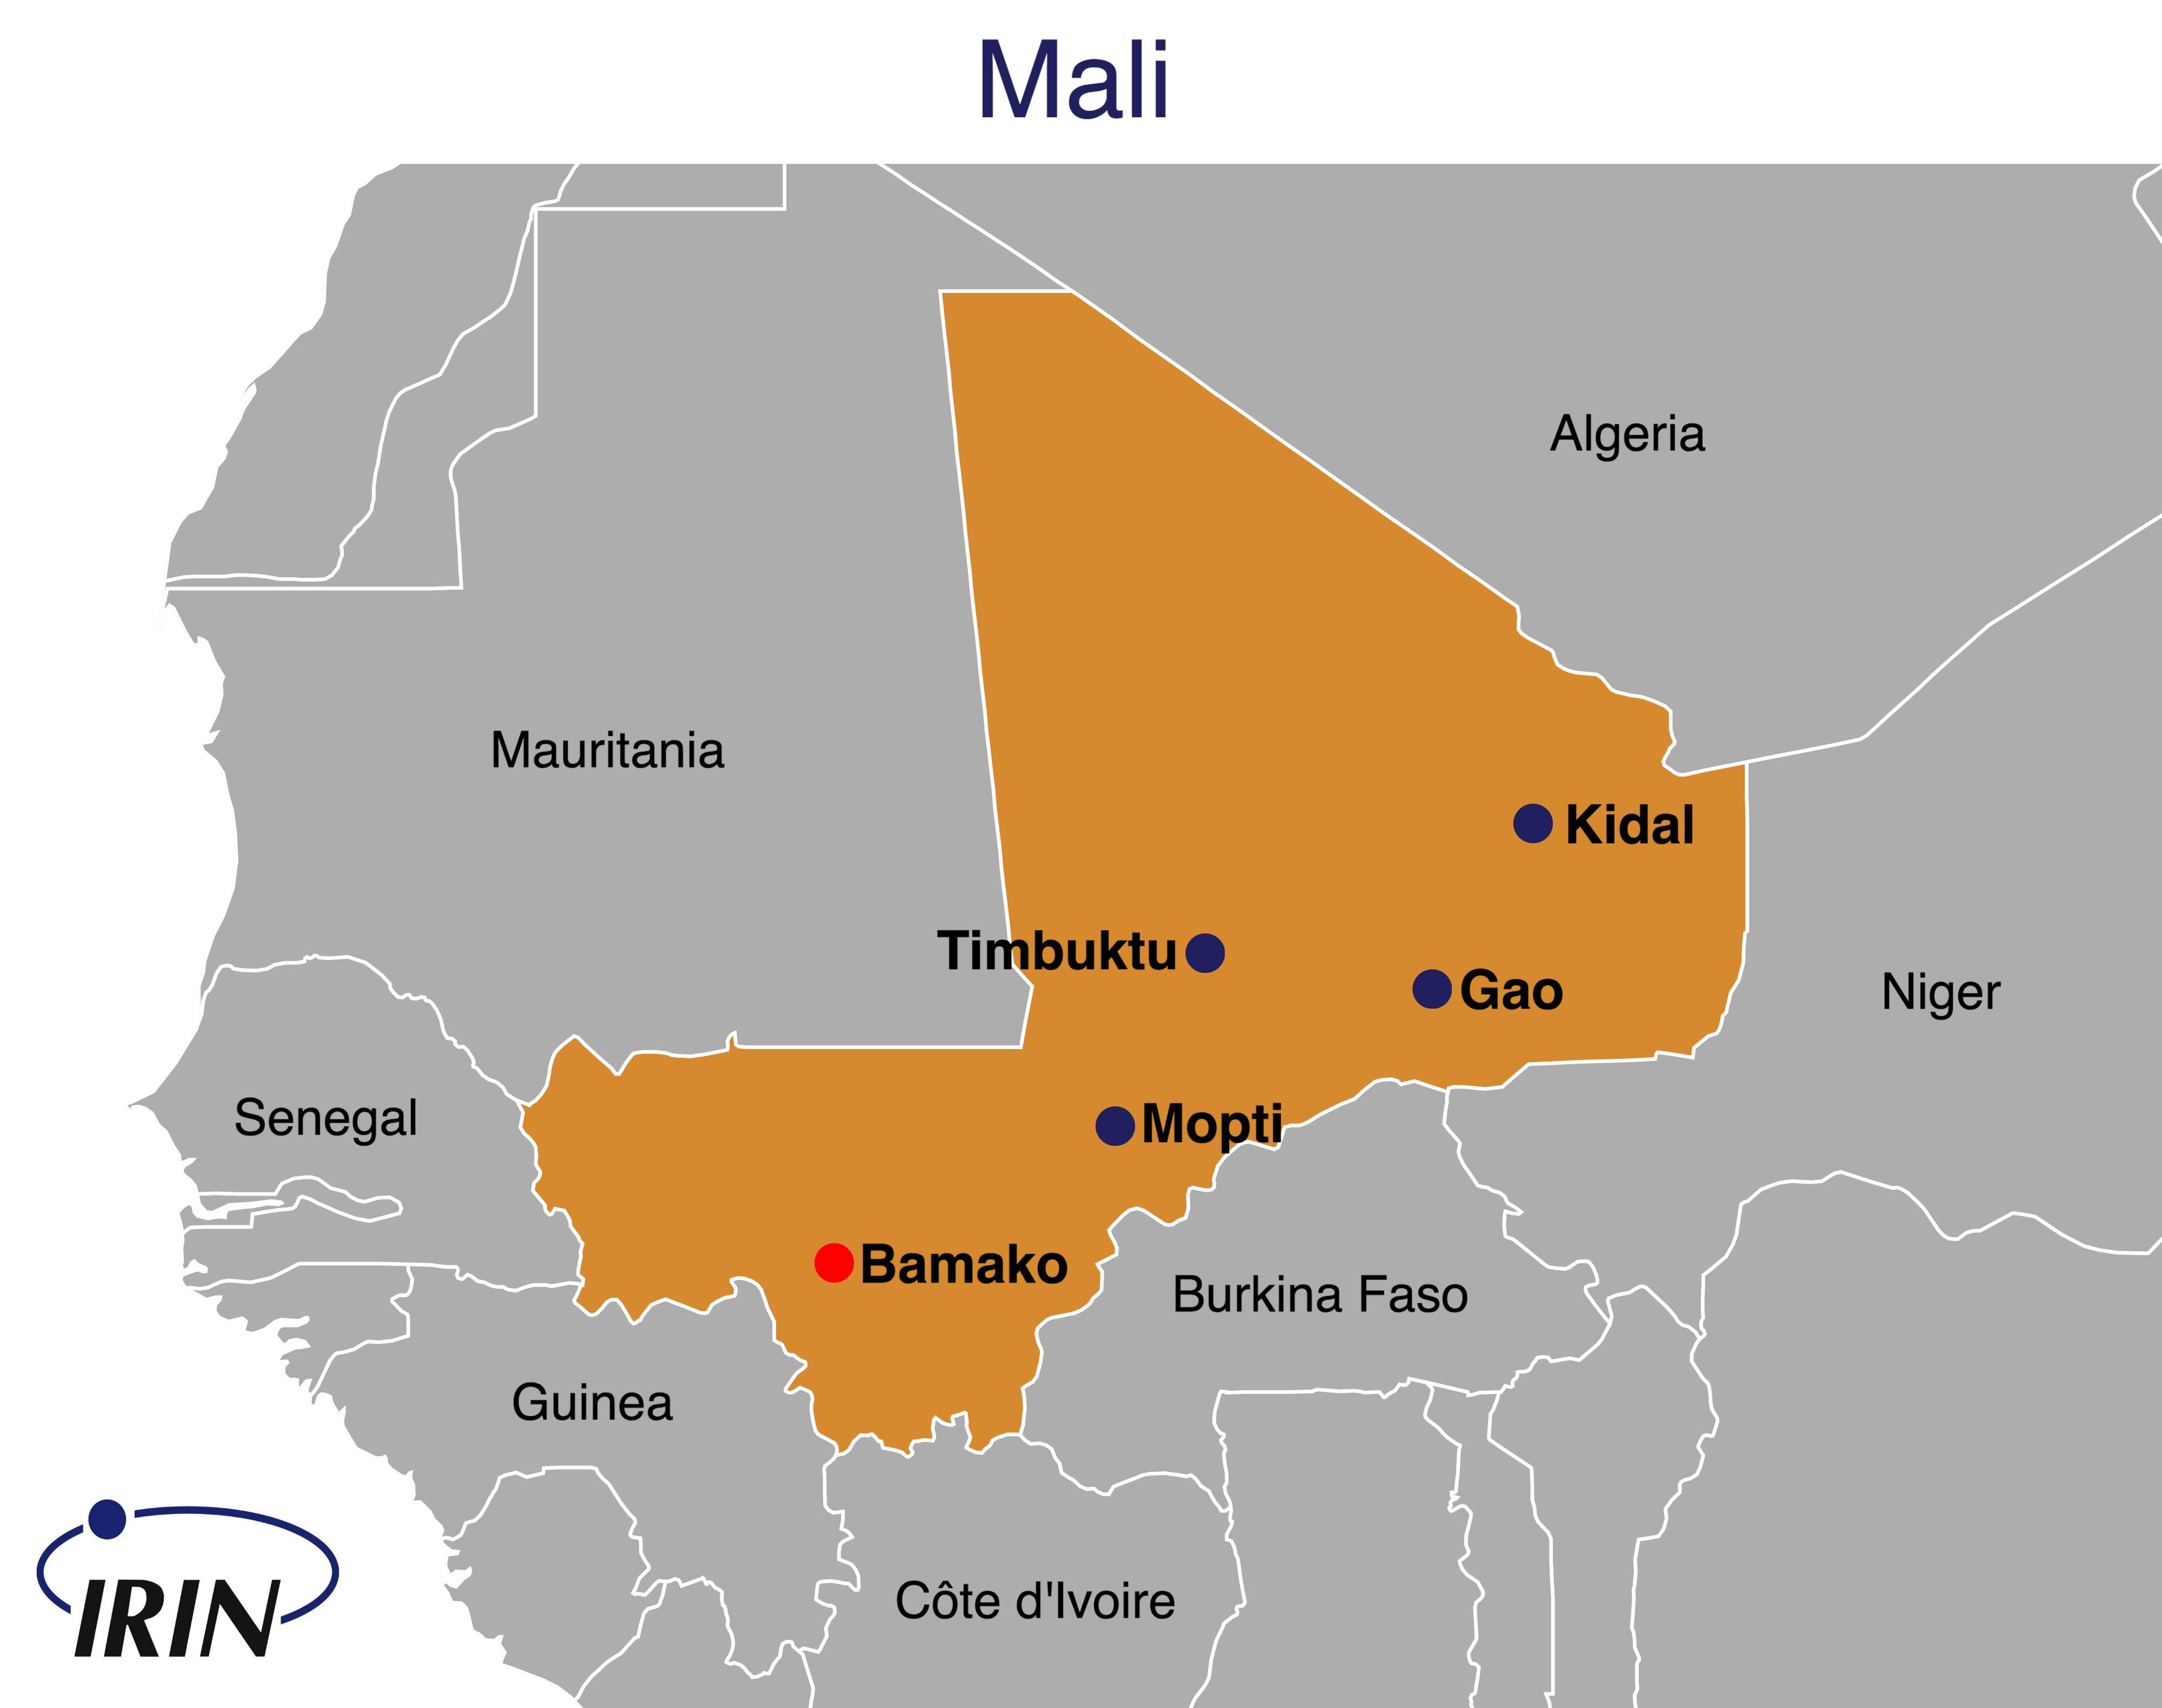 Irin Trouble In The Heart Of Mali